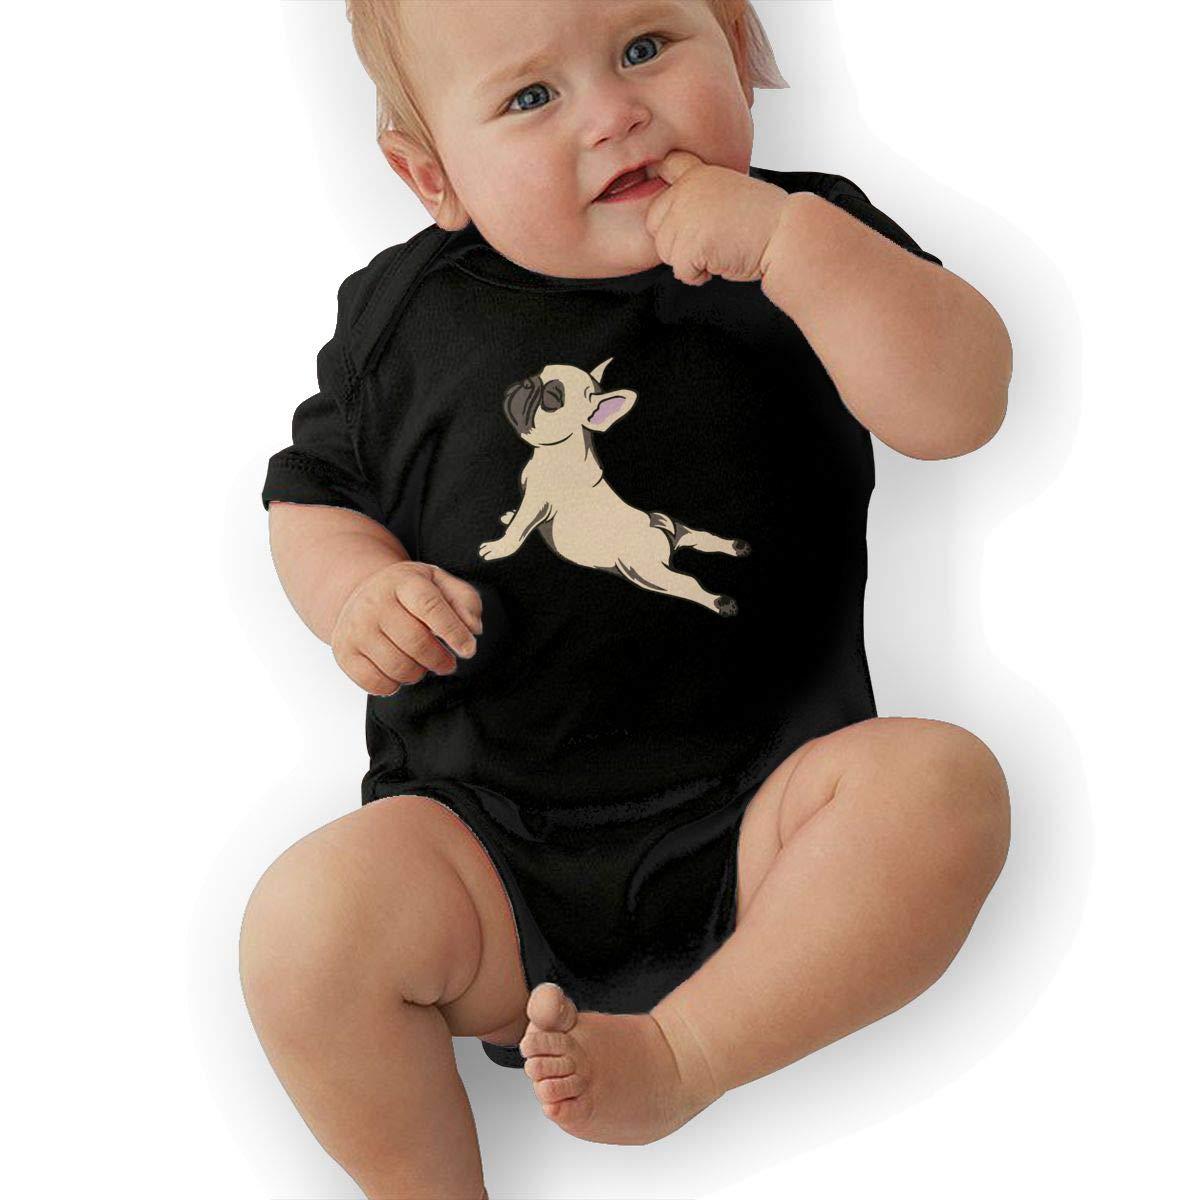 Soft French Bulldog Sleepwear U88oi-8 Short Sleeve Cotton Rompers for Baby Girls Boys